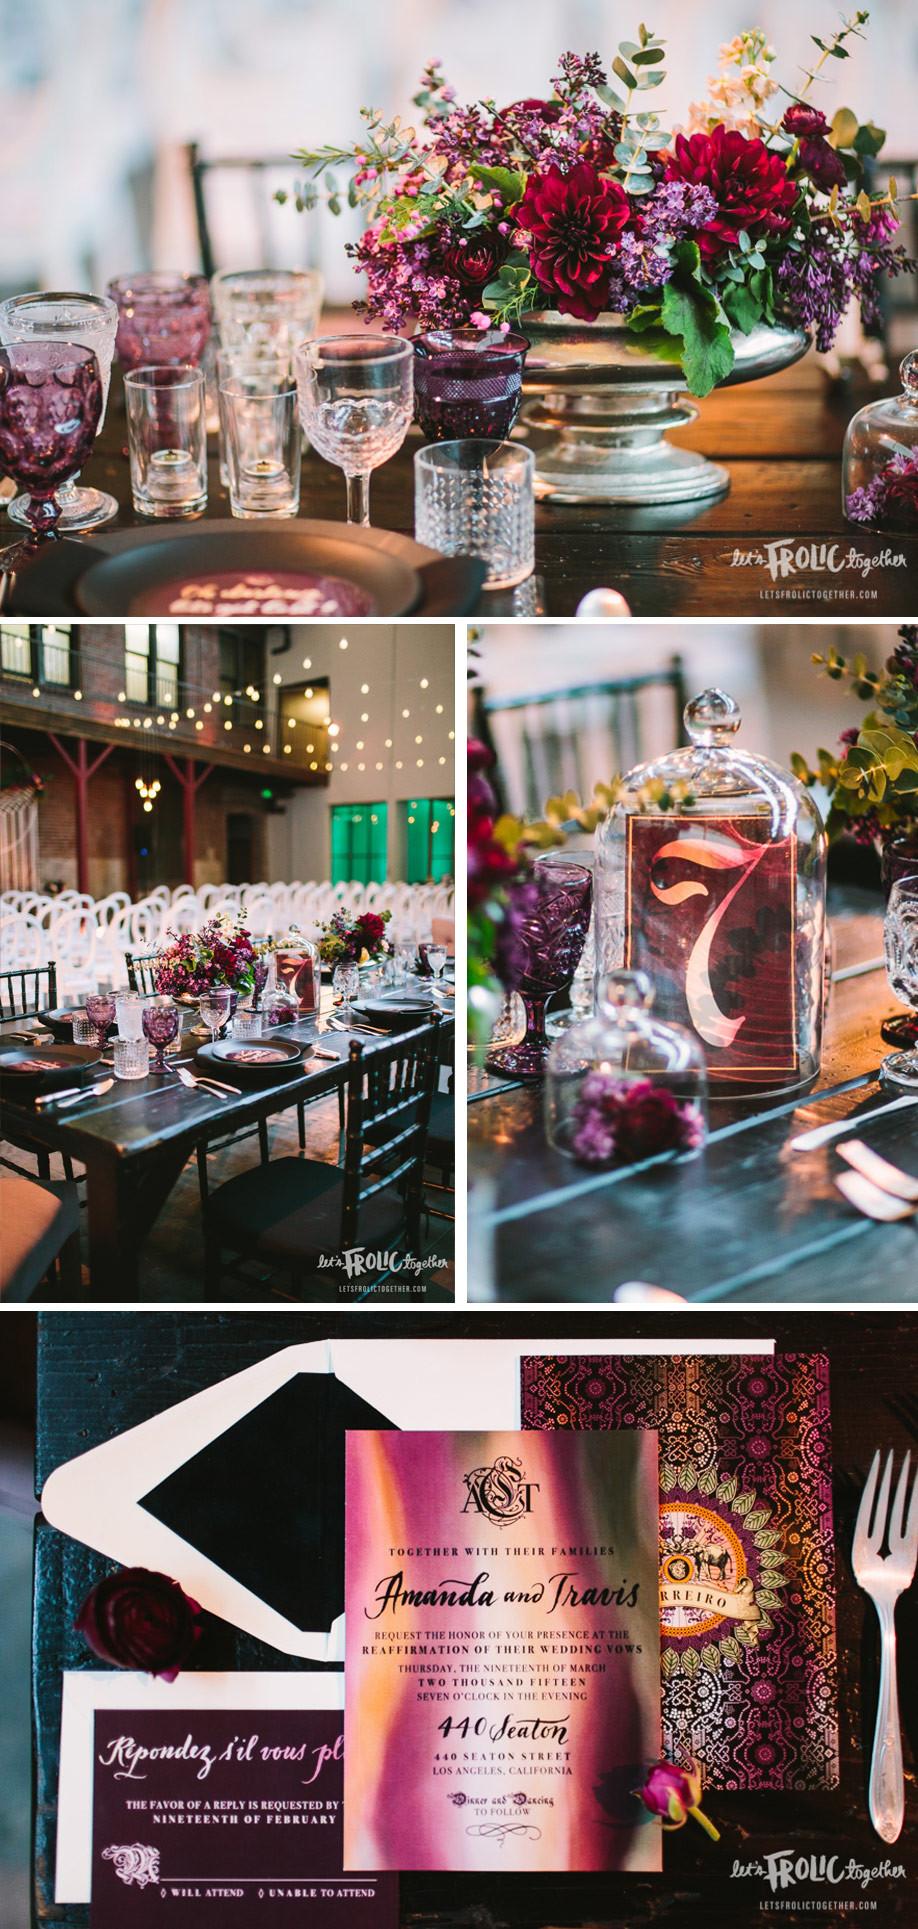 BFW_frankly.weddings_let'sfrolictogether_TABLE-7.jpg